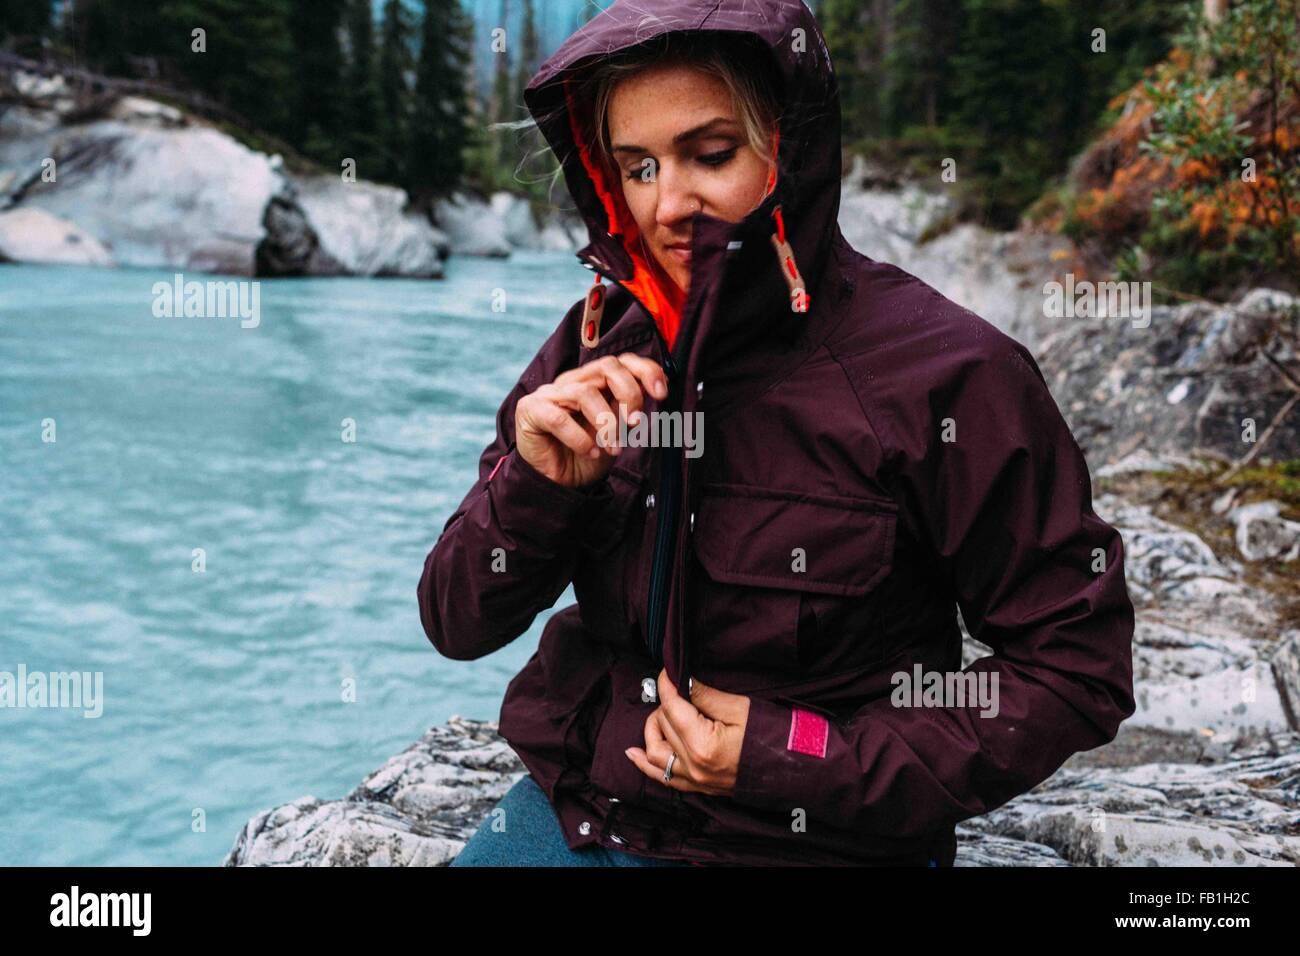 Mid adult woman par waters edge zipping up manteau imperméable, lac Moraine, Banff National Park, Alberta Canada Photo Stock